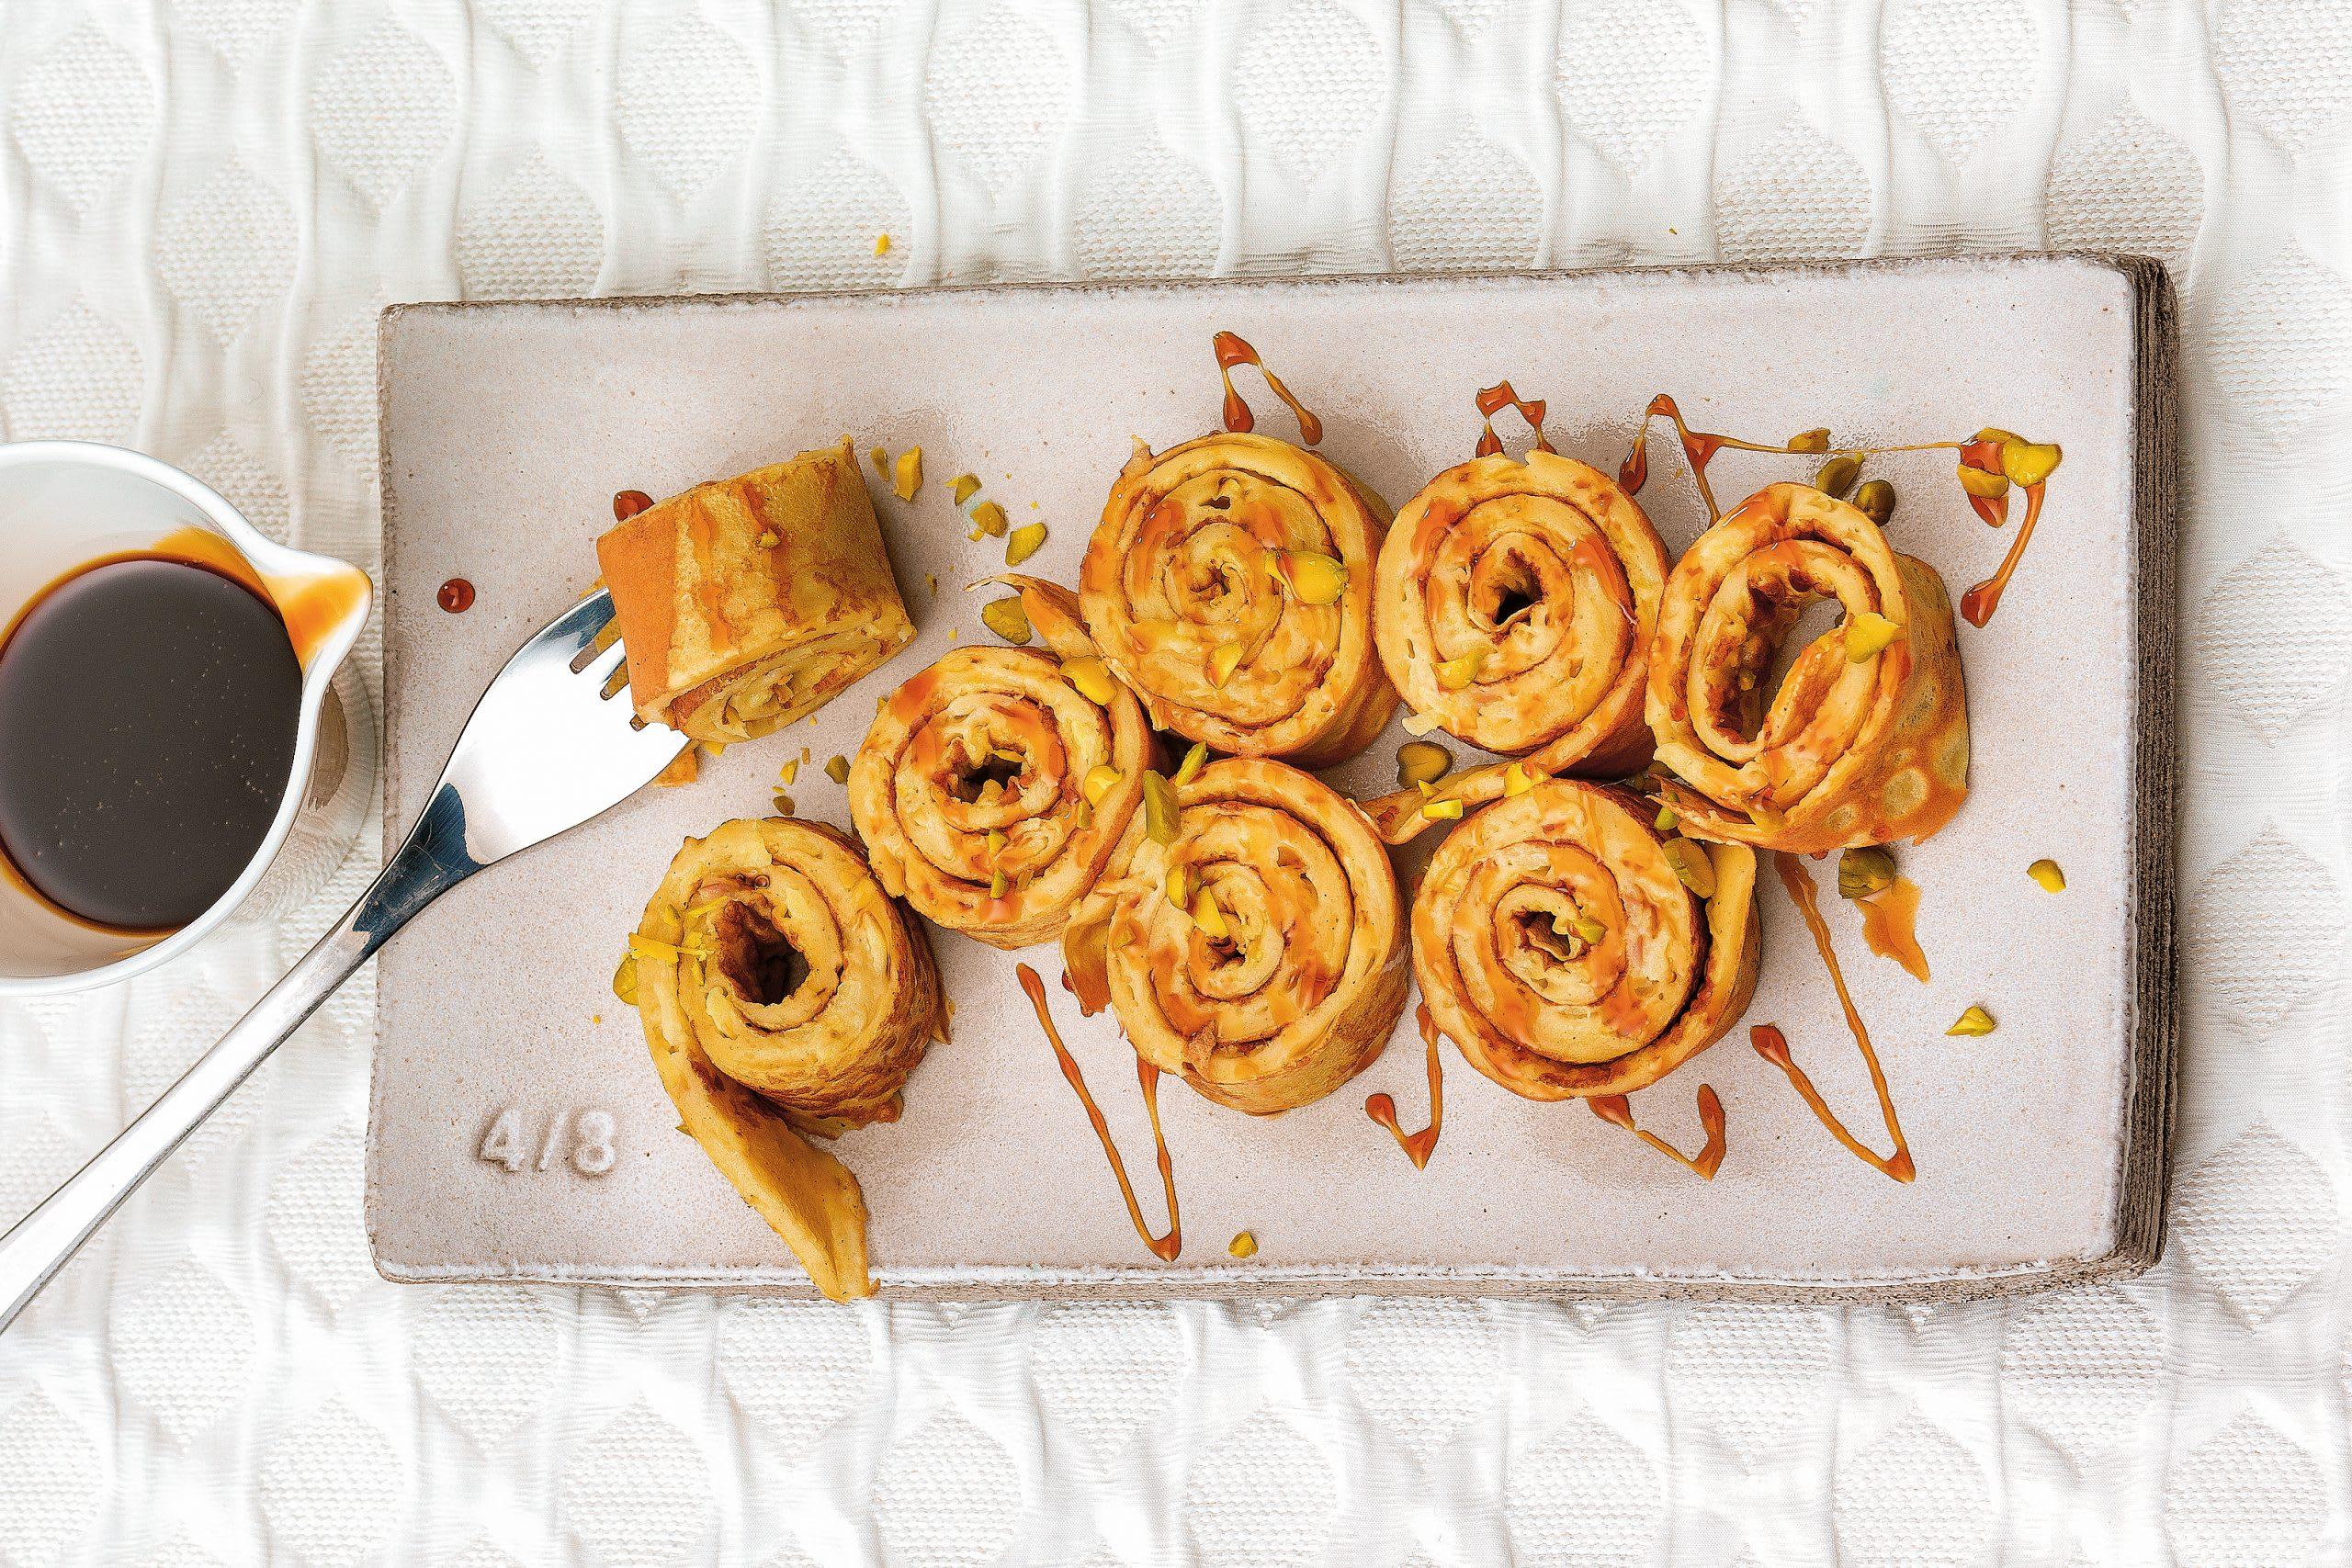 Crêpes aux pommes en escargot